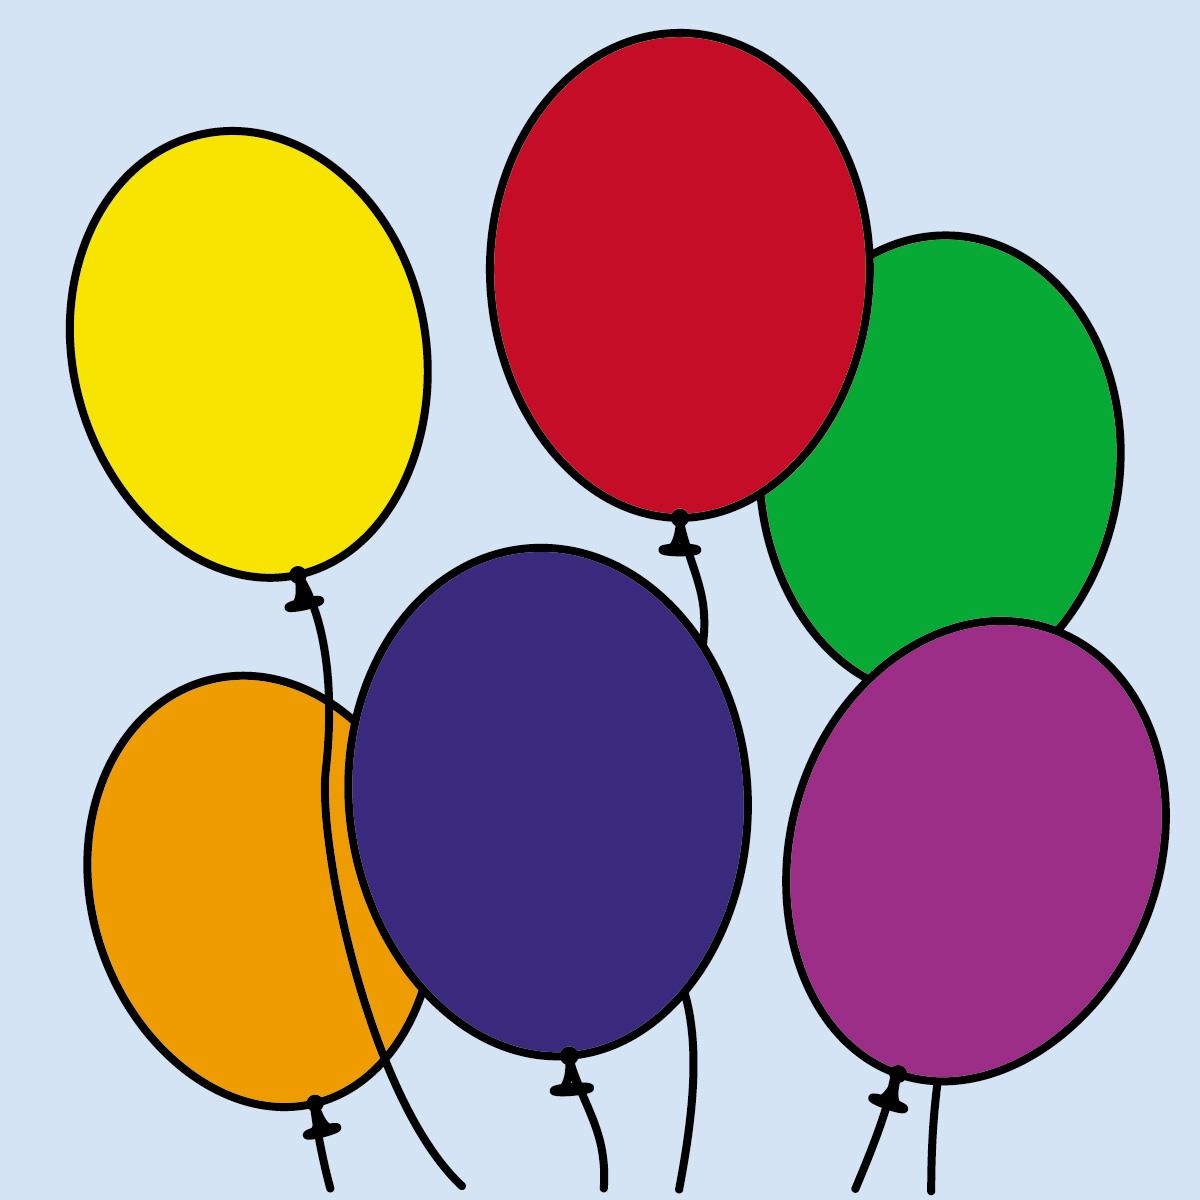 Clipart balloons six, Clipart balloons six Transparent FREE.